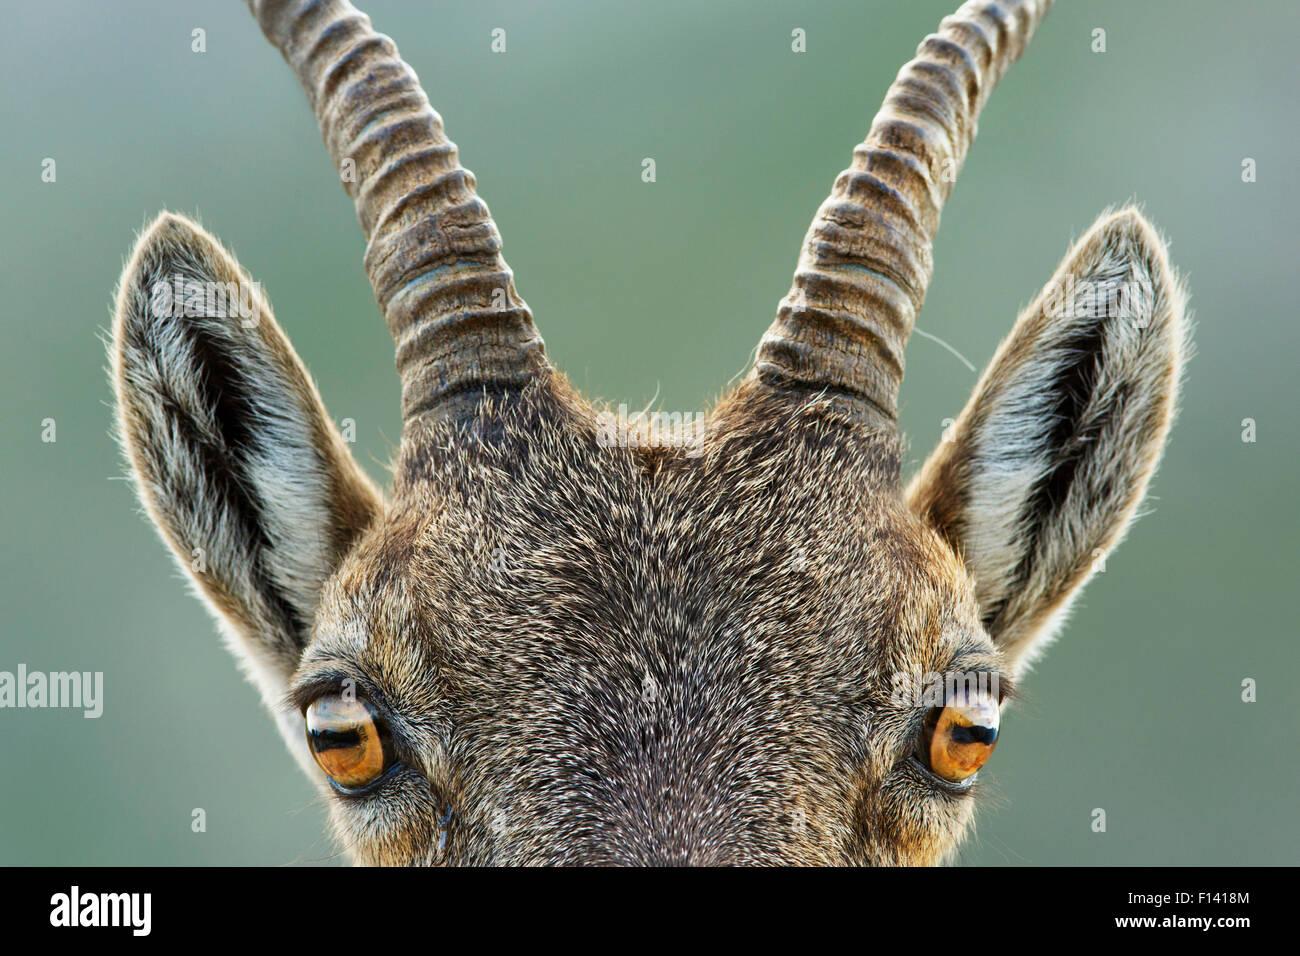 Alpine ibex (Capra ibex) close up portrait of young, Bernese Alps, Switzerland, August. - Stock Image